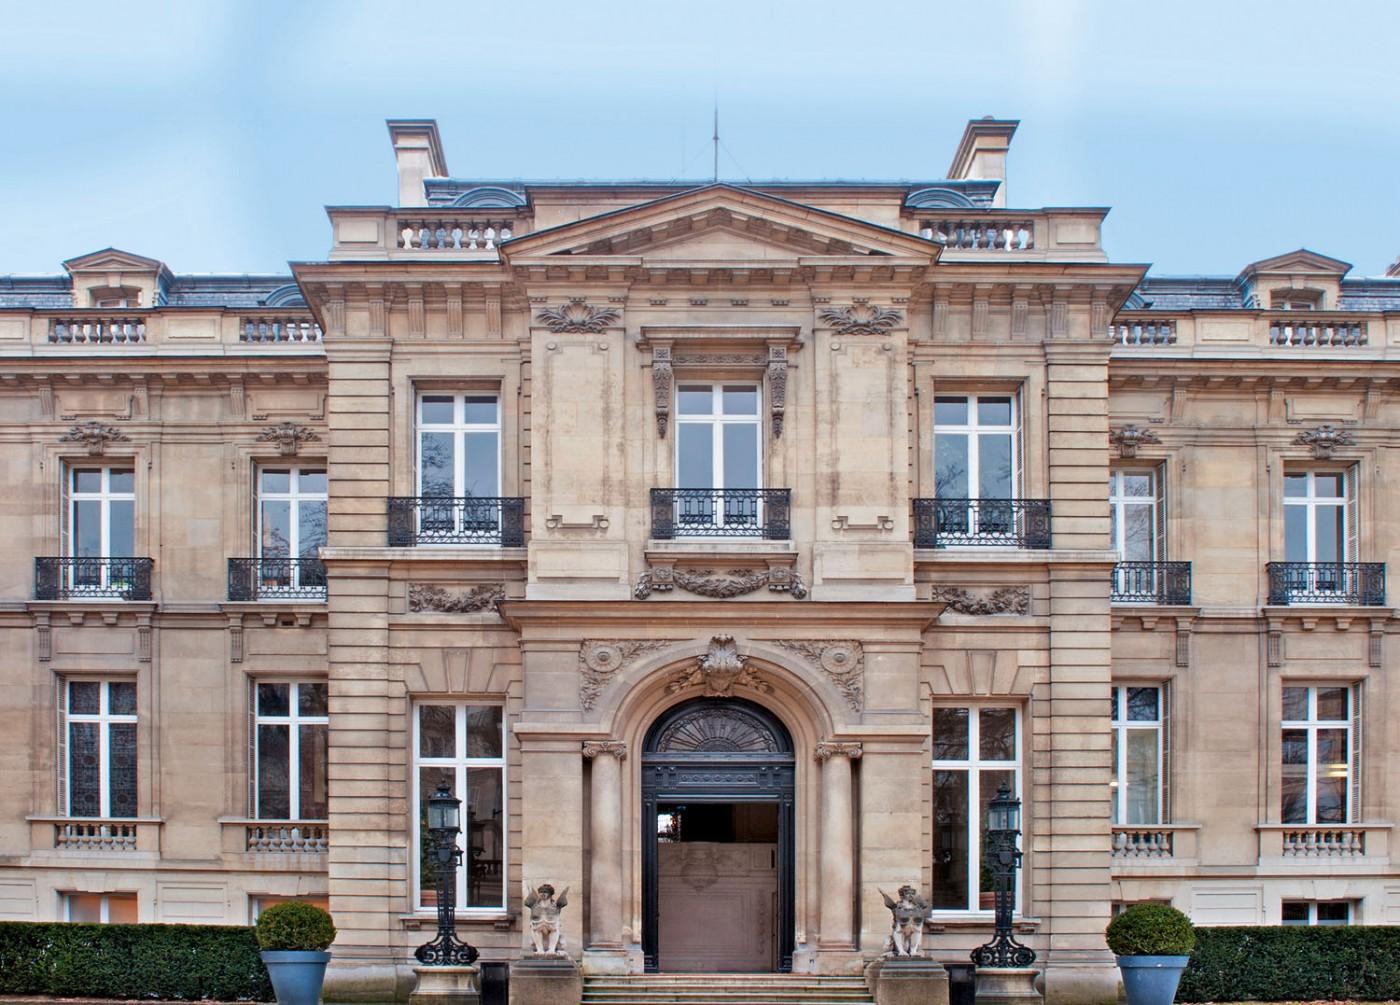 Hôtel Salomon de Rothschild © FNAGP